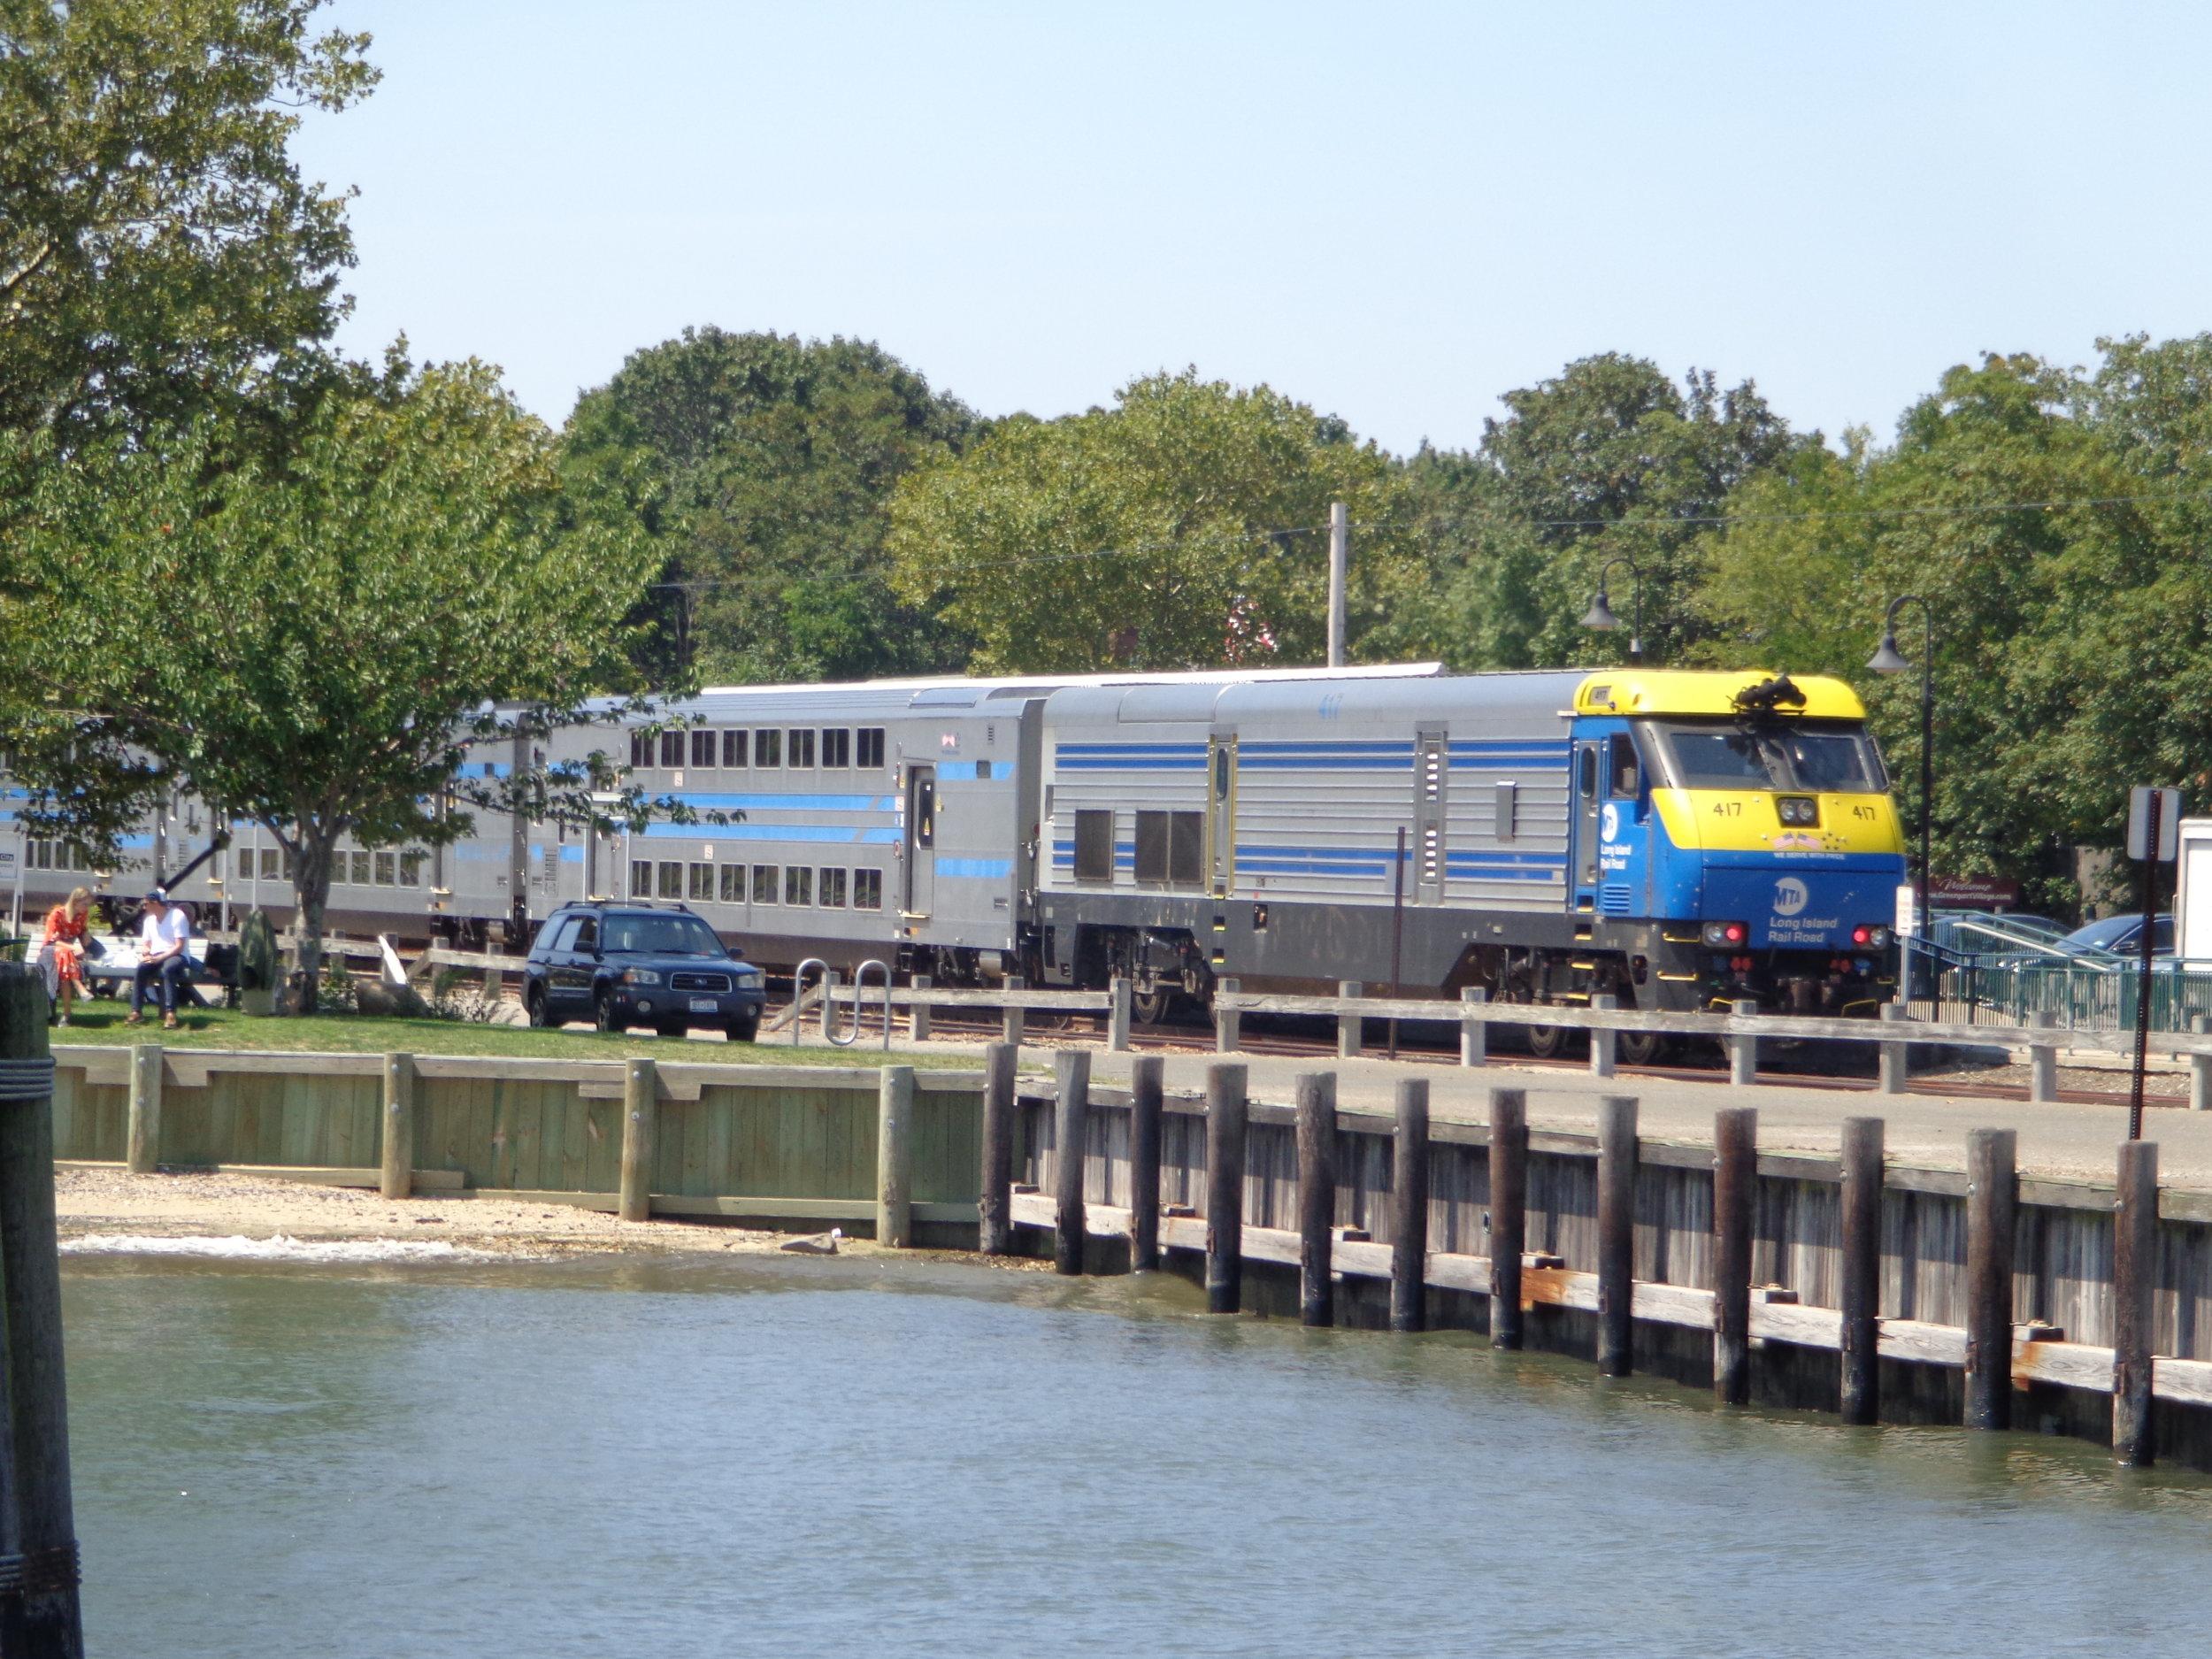 2017 Annual Picnic - Railroad Museum of L.I., Riverhead & Greenport